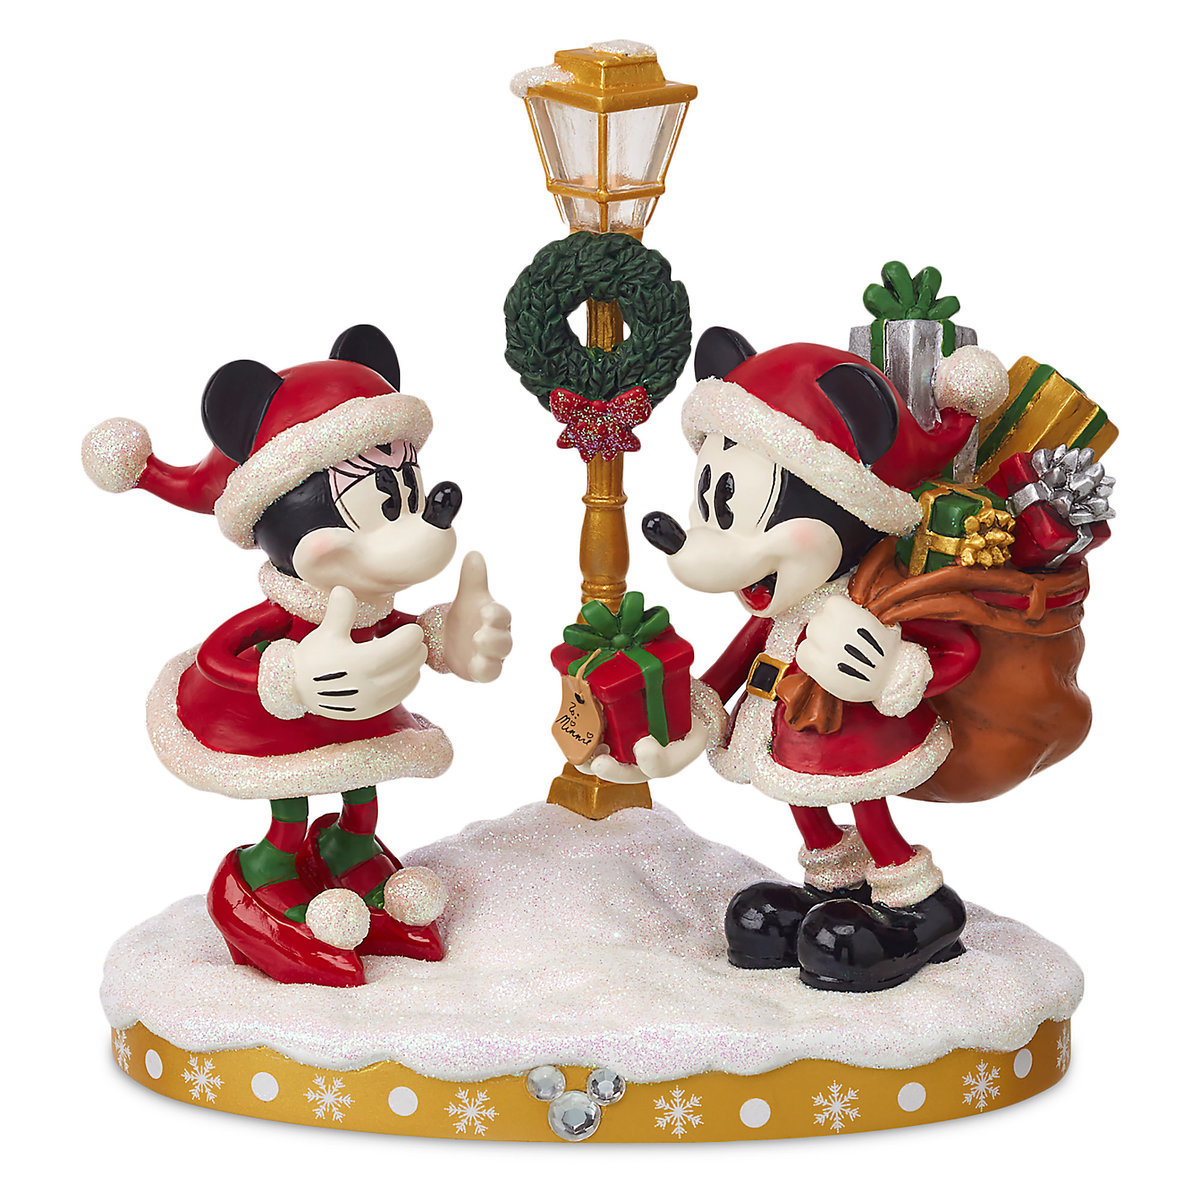 b69e9f7e6f7b0 Add to My Lists. Disney Christmas Figurine - Santa Mickey   Minnie Mouse -  Light-Up